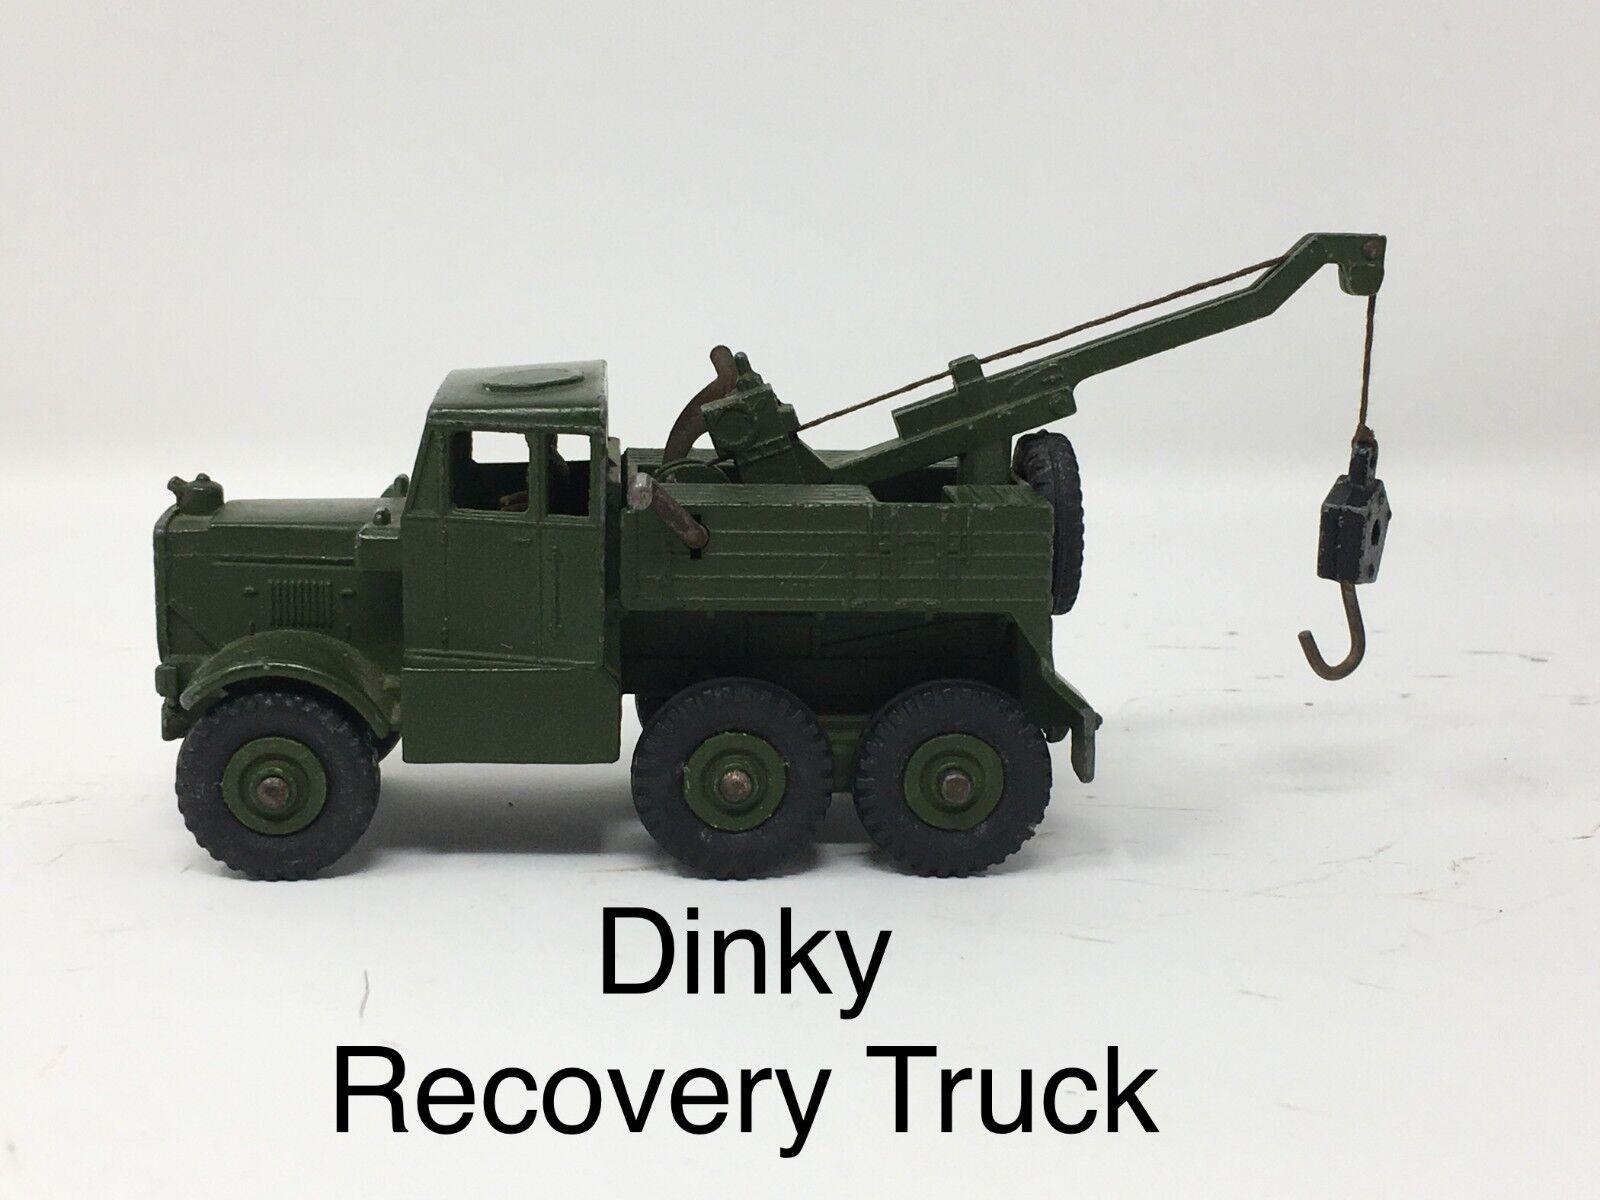 Dinky Recuperación Camión Tractor   verde Militar Nº 661 Made in England Meccano